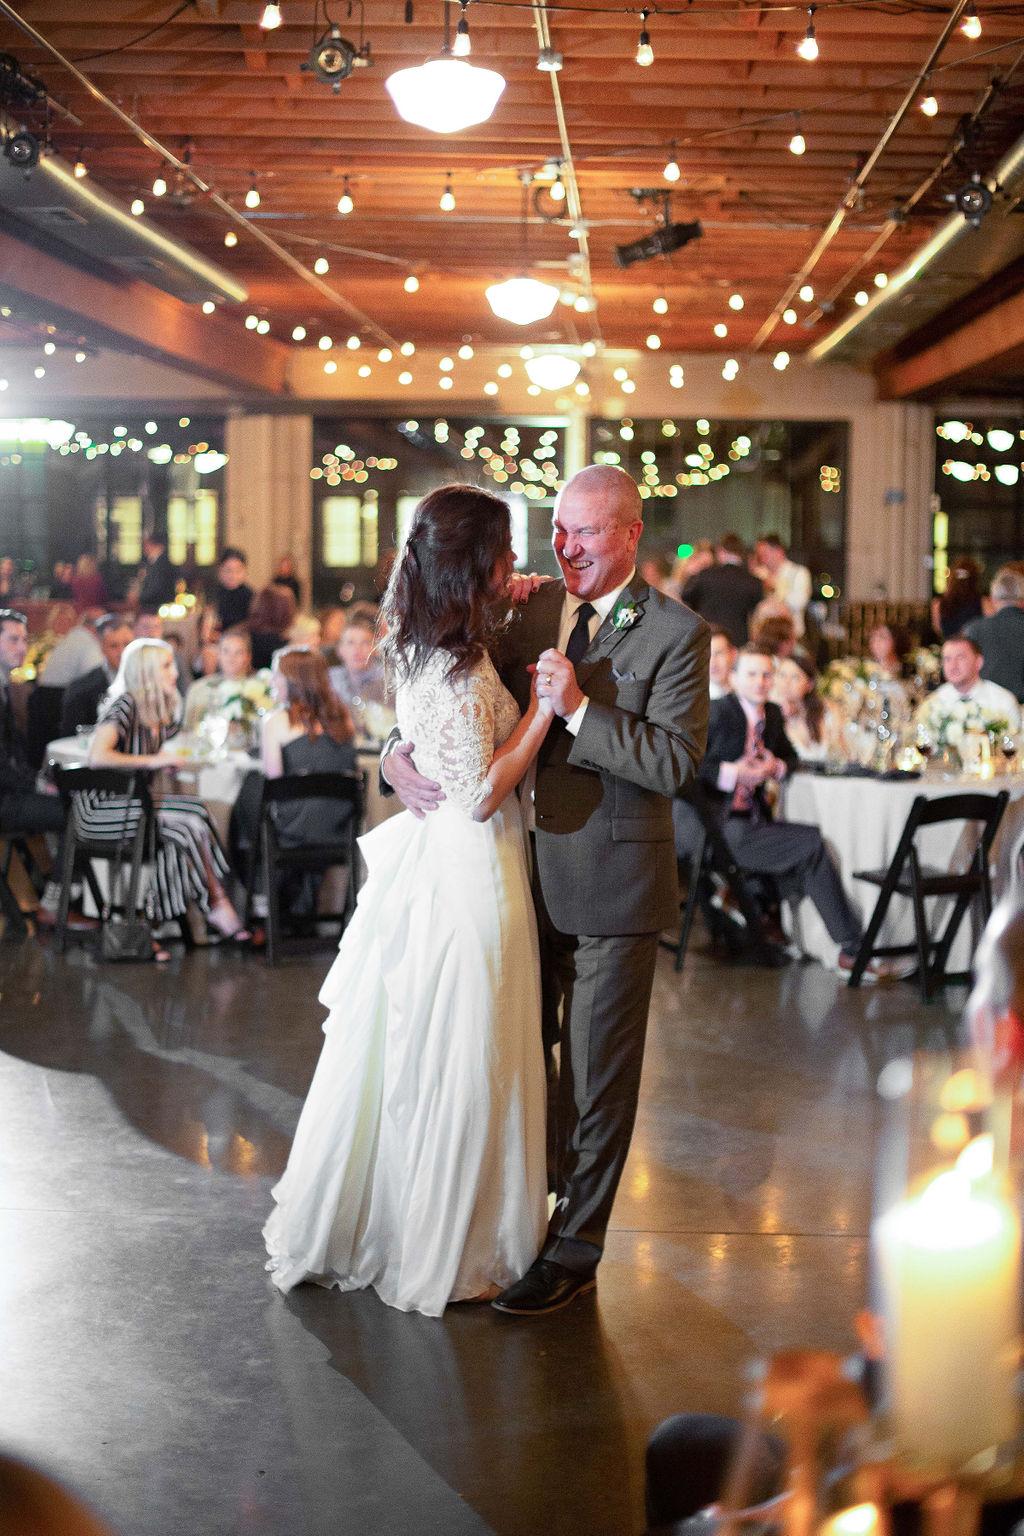 033_reception_portland,oregon,castaway,wedding,by_outlive_creative,photo,and,video.jpg